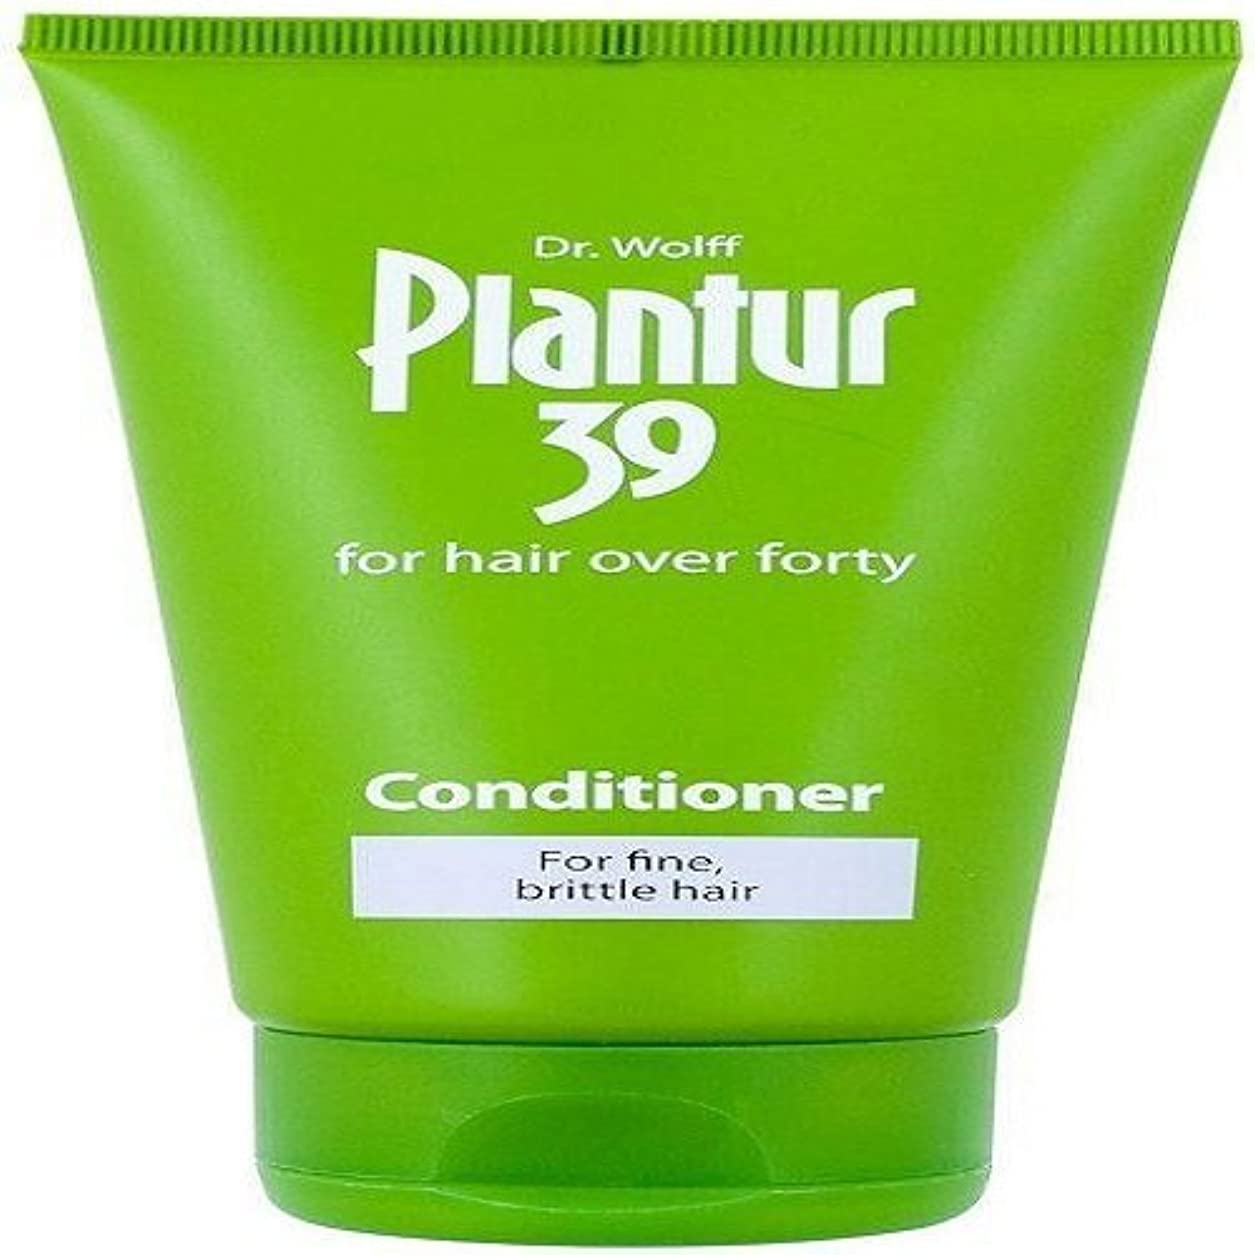 Plantur 39 150ml Fine & Brittle hair conditioner by Plantur [並行輸入品]